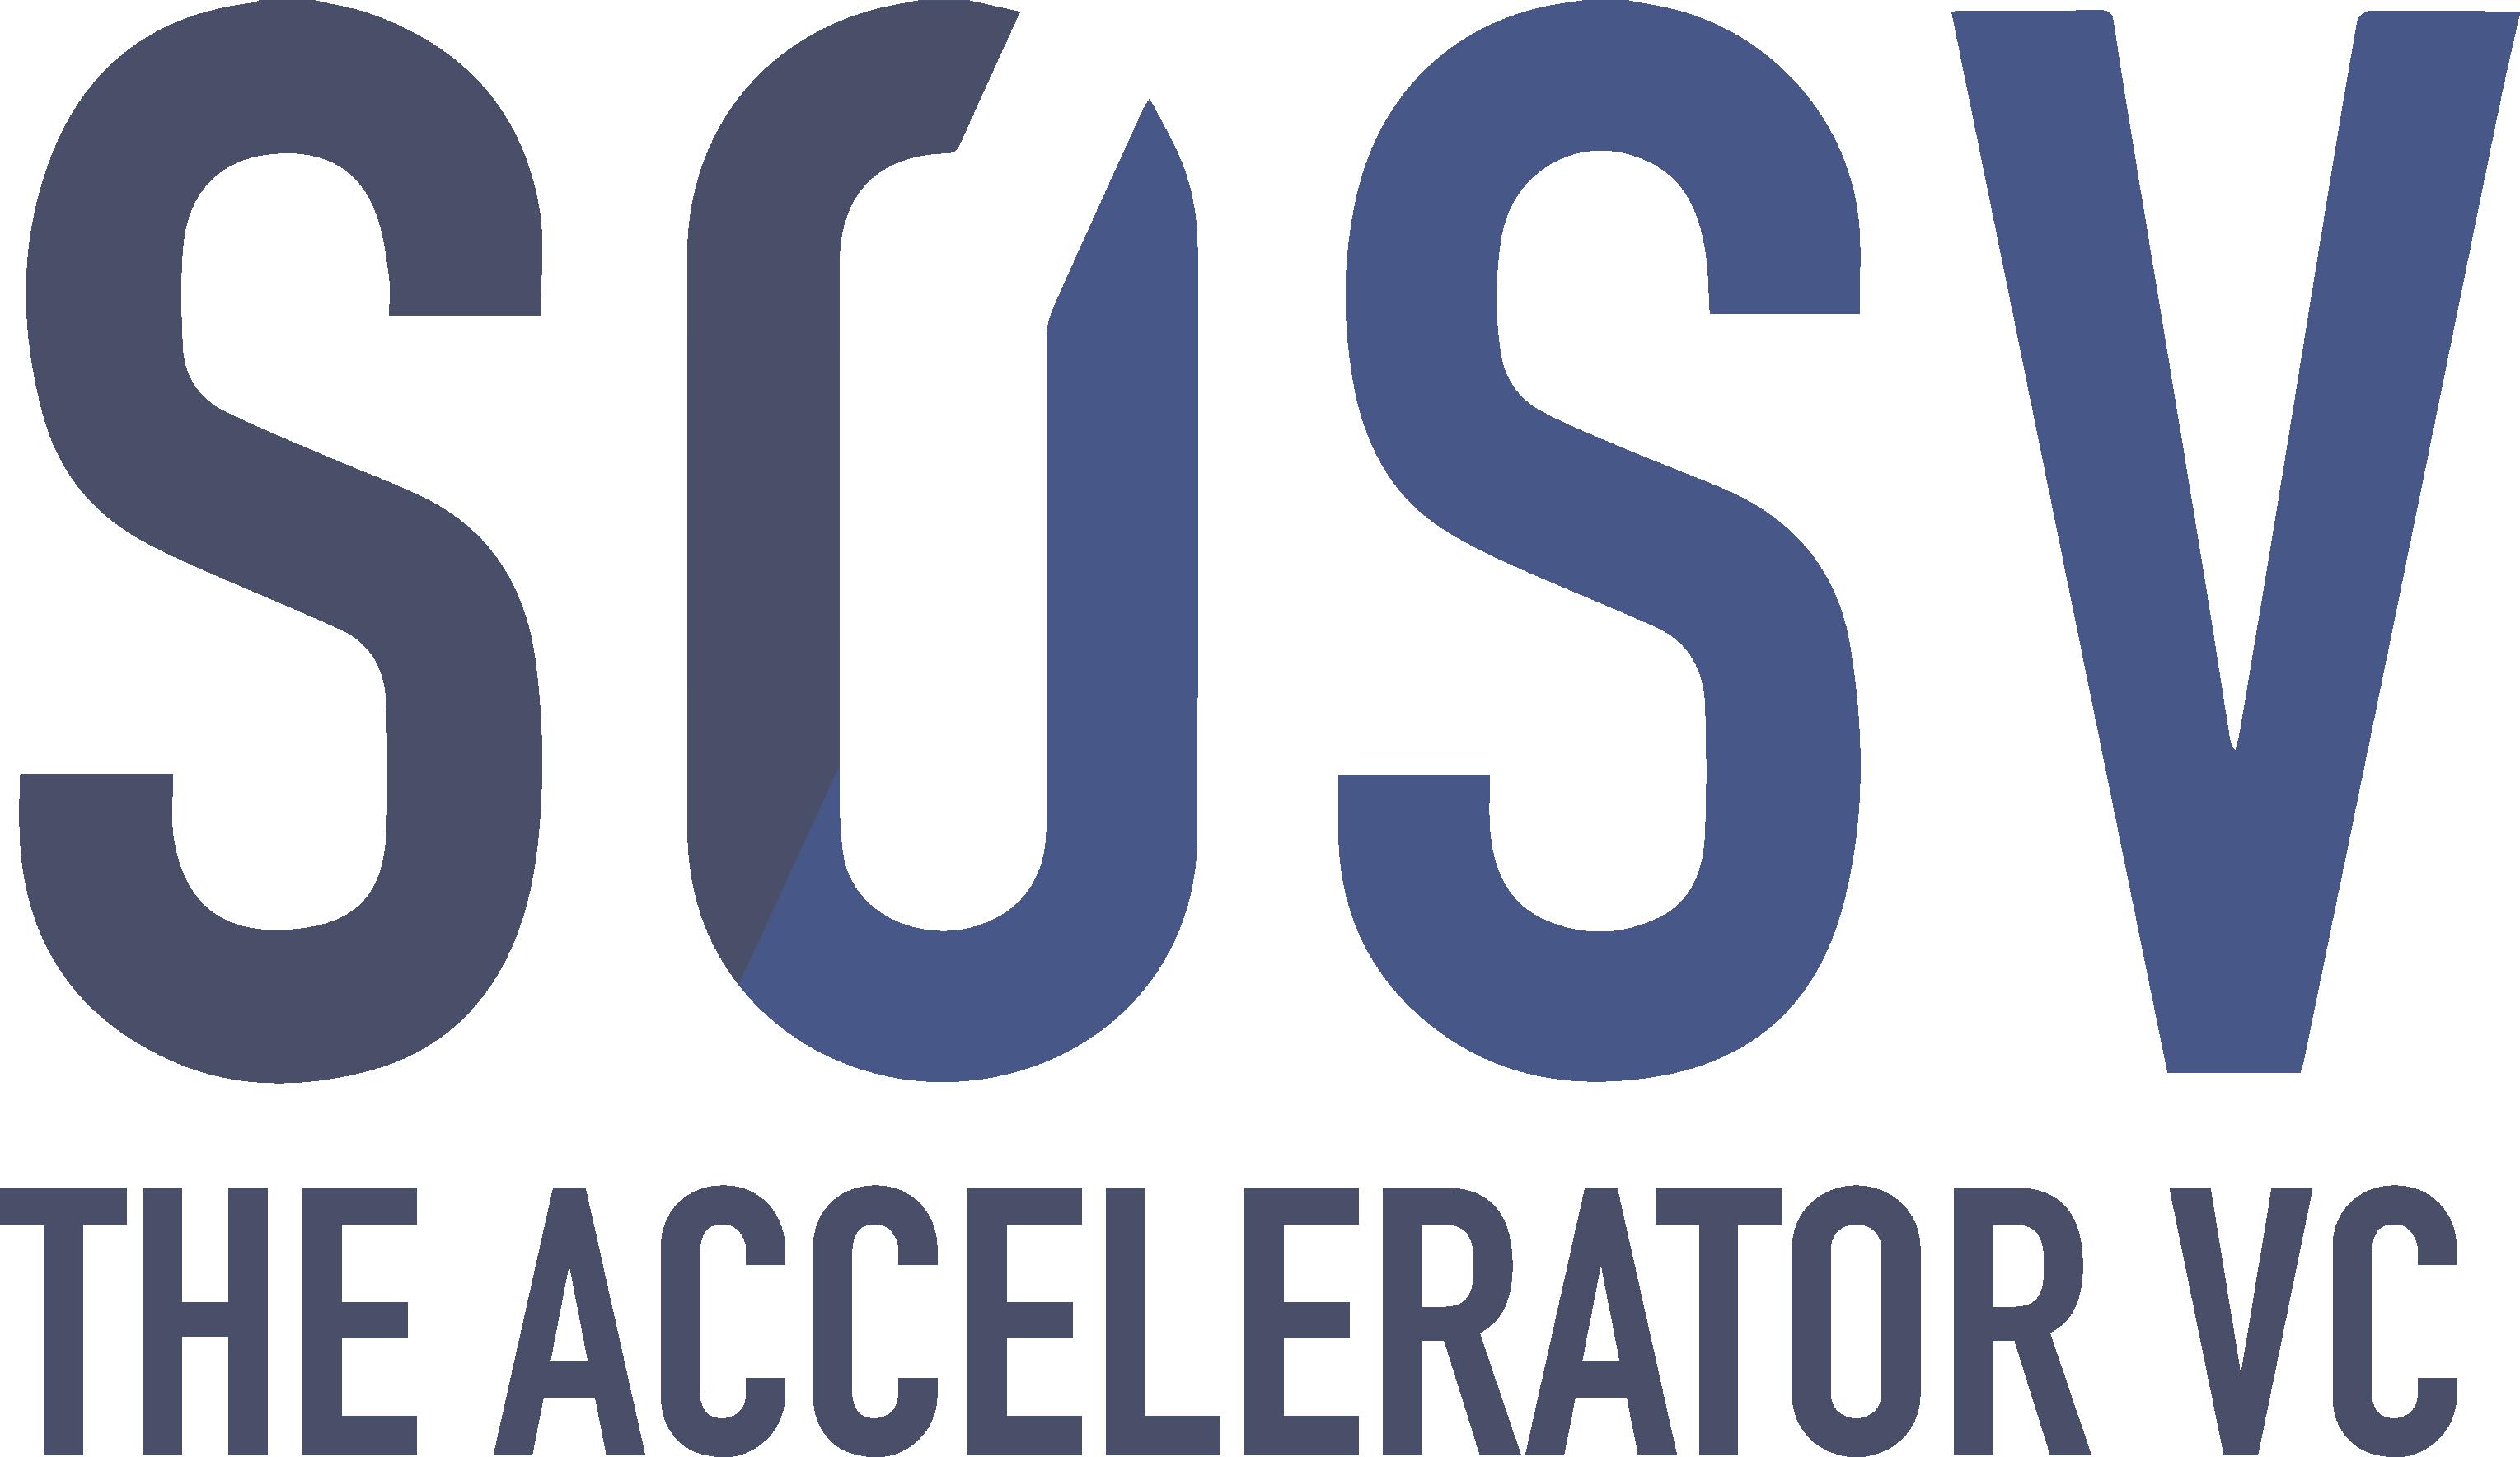 sosv the accelerator logo